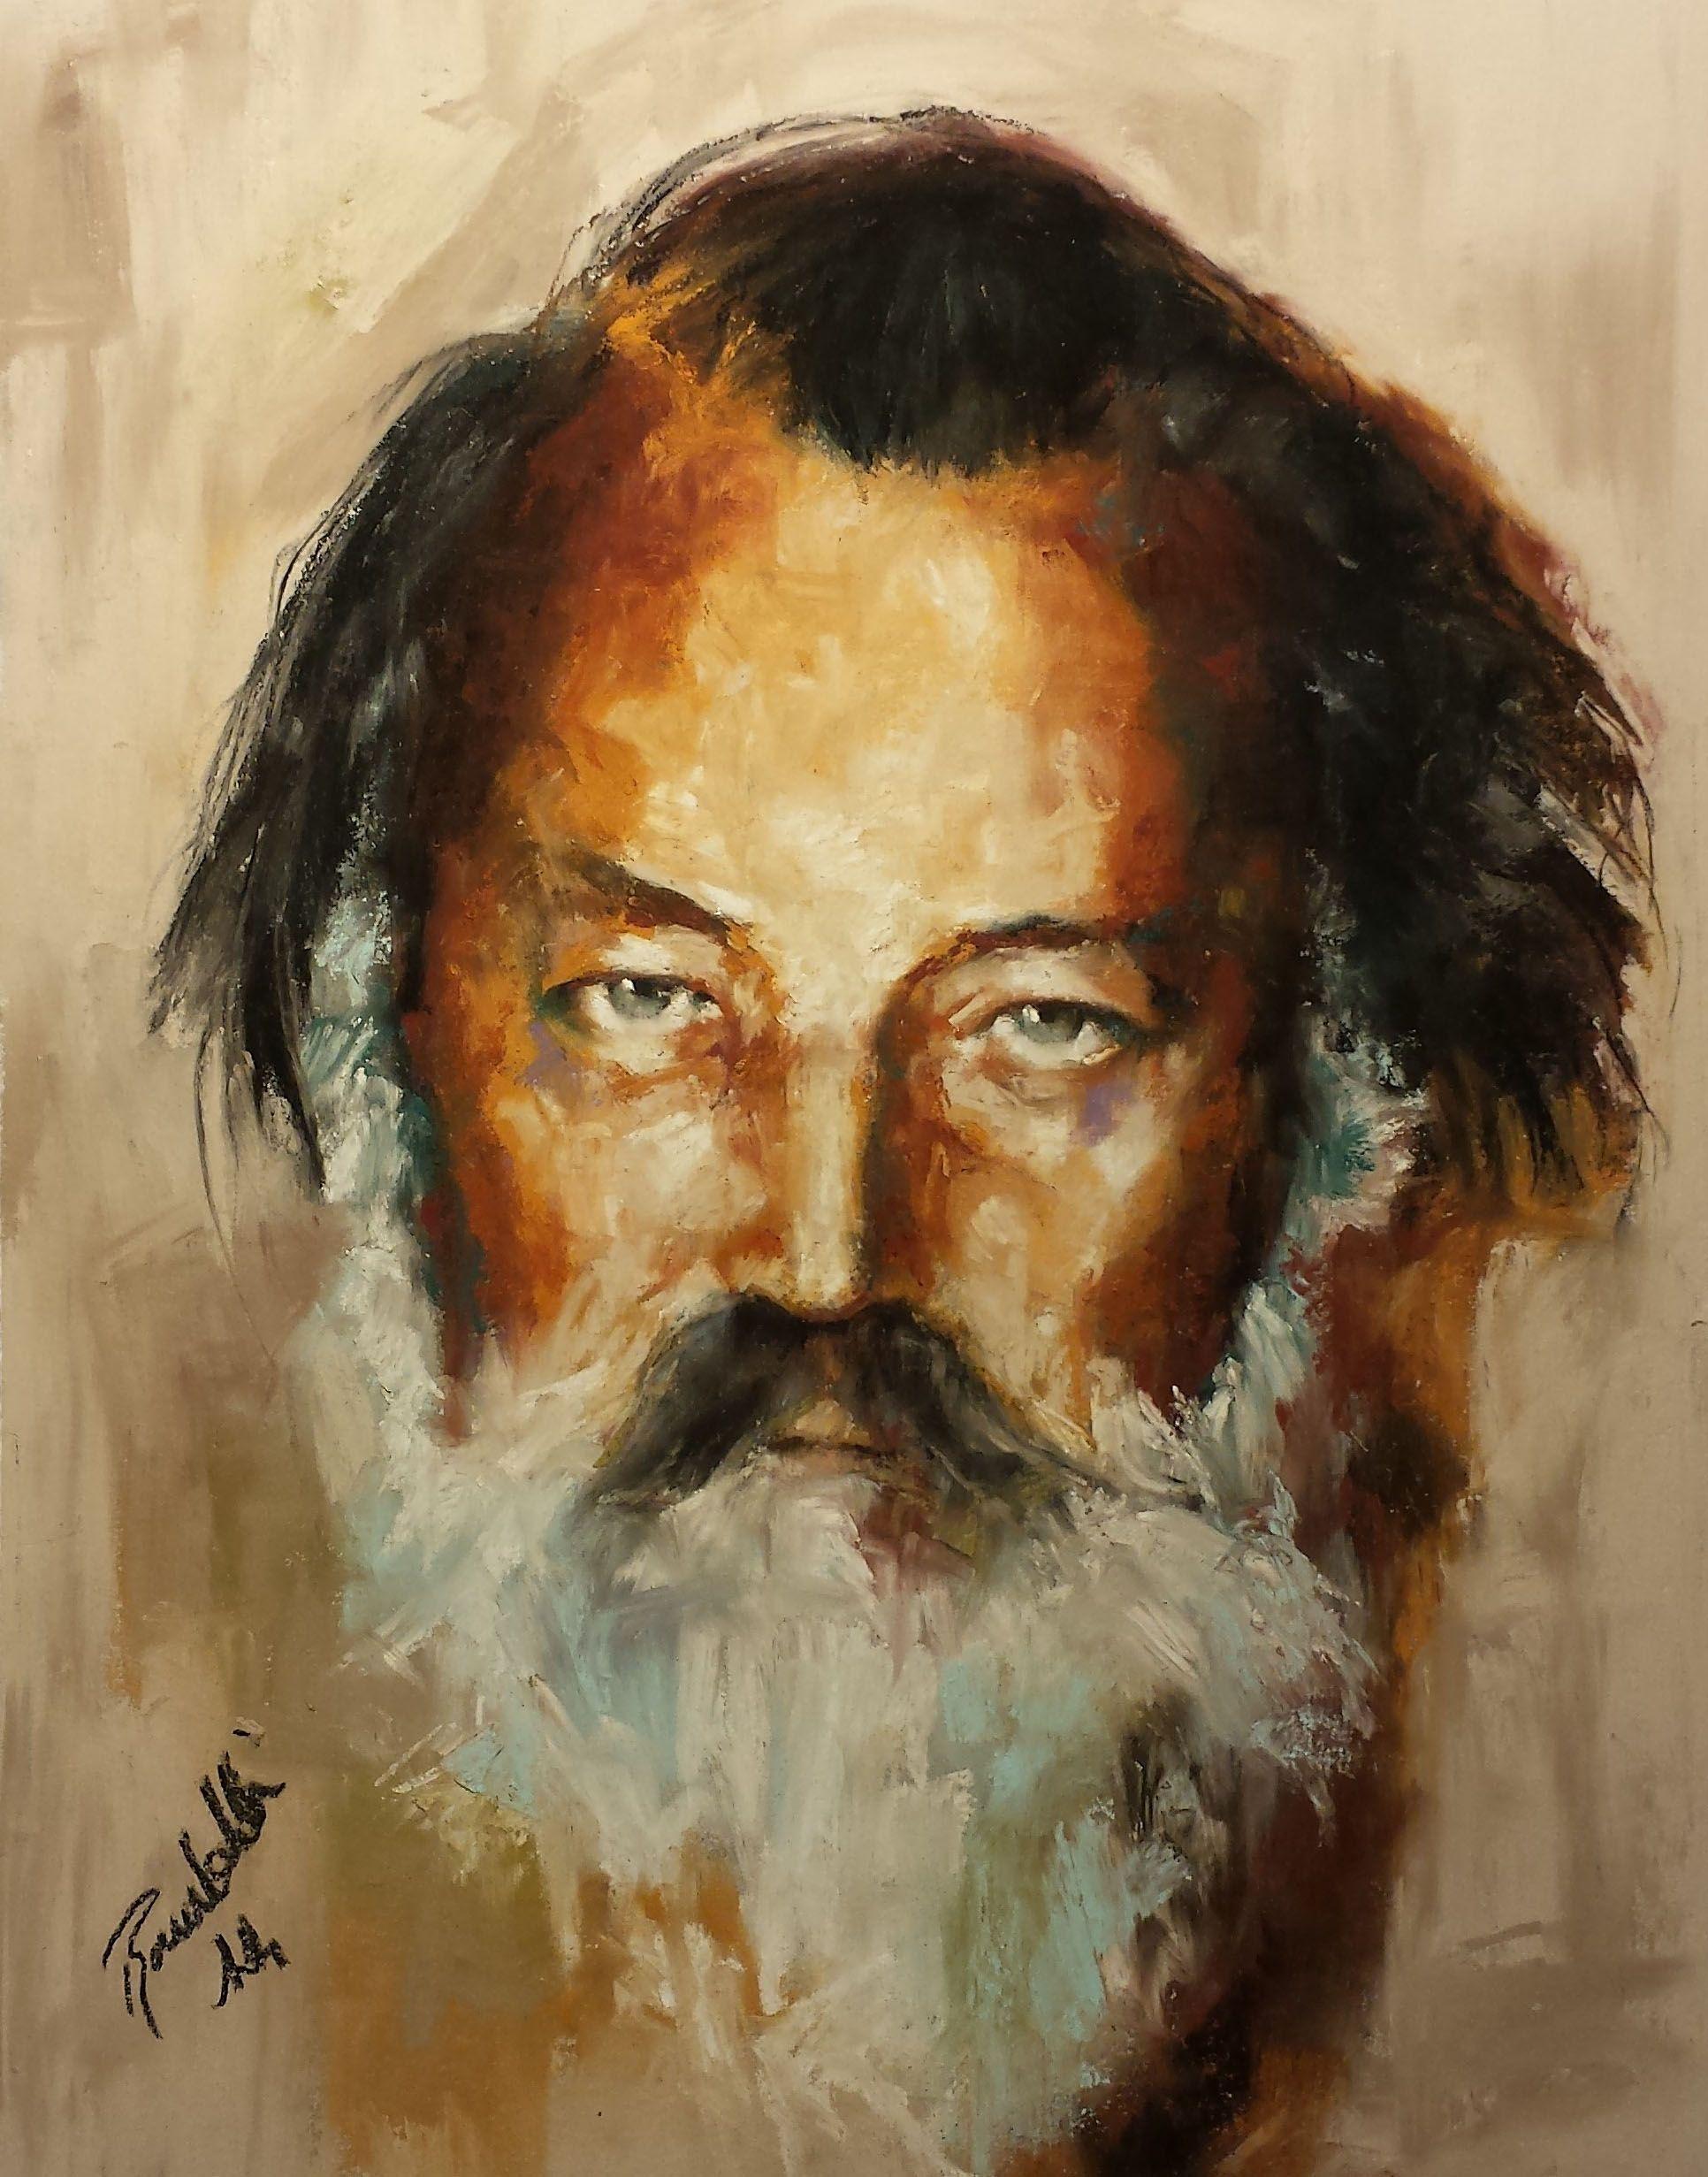 Johannes brahms dipinto a pastello 30 x 40 portraits pinterest johannes brahms dipinto a pastello 30 x 40 fandeluxe Image collections